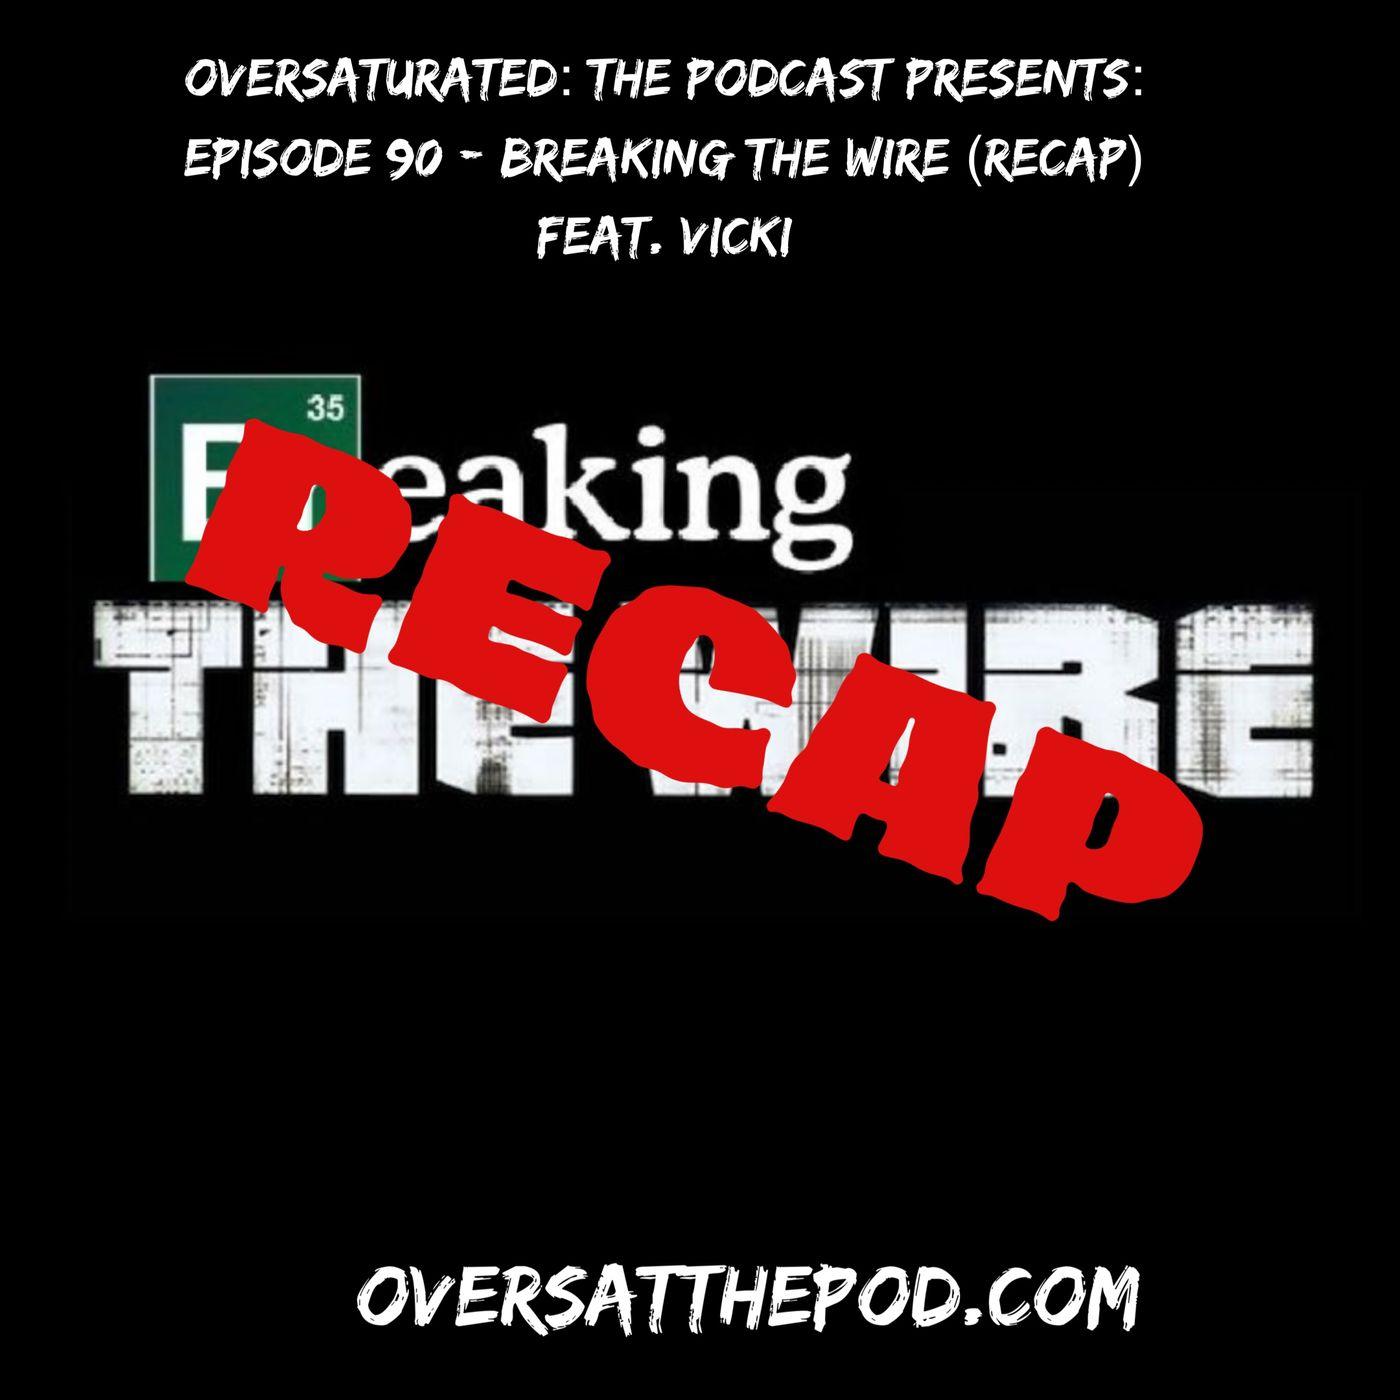 Episode 90 - Breaking The Wire (Recap) Feat. Vicki